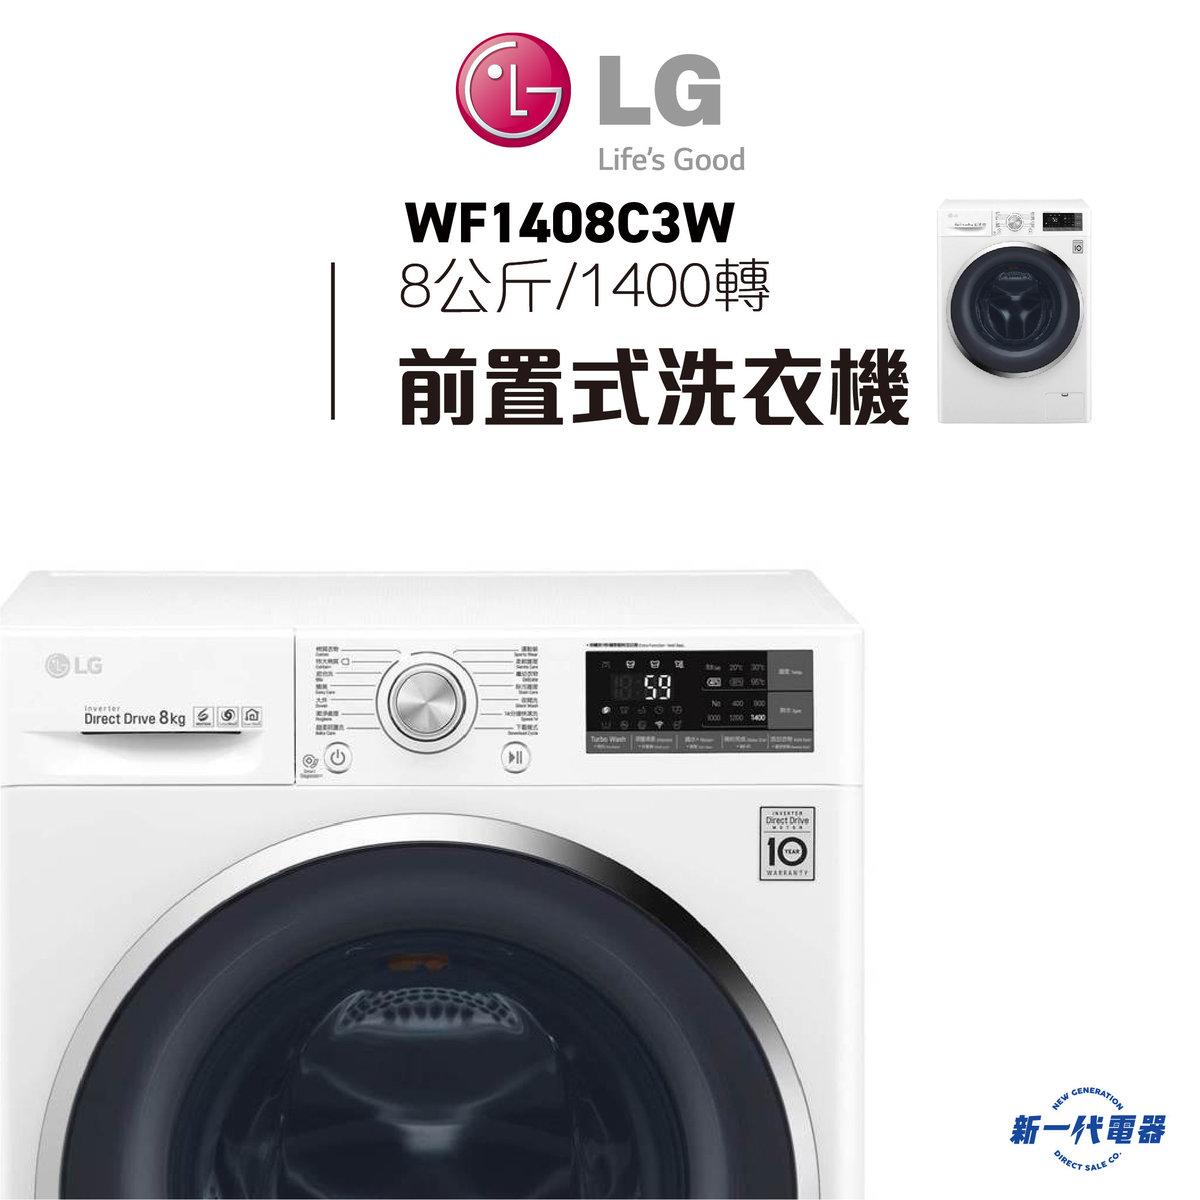 WF1408C3W 8KG 1400rpm Washing Machine